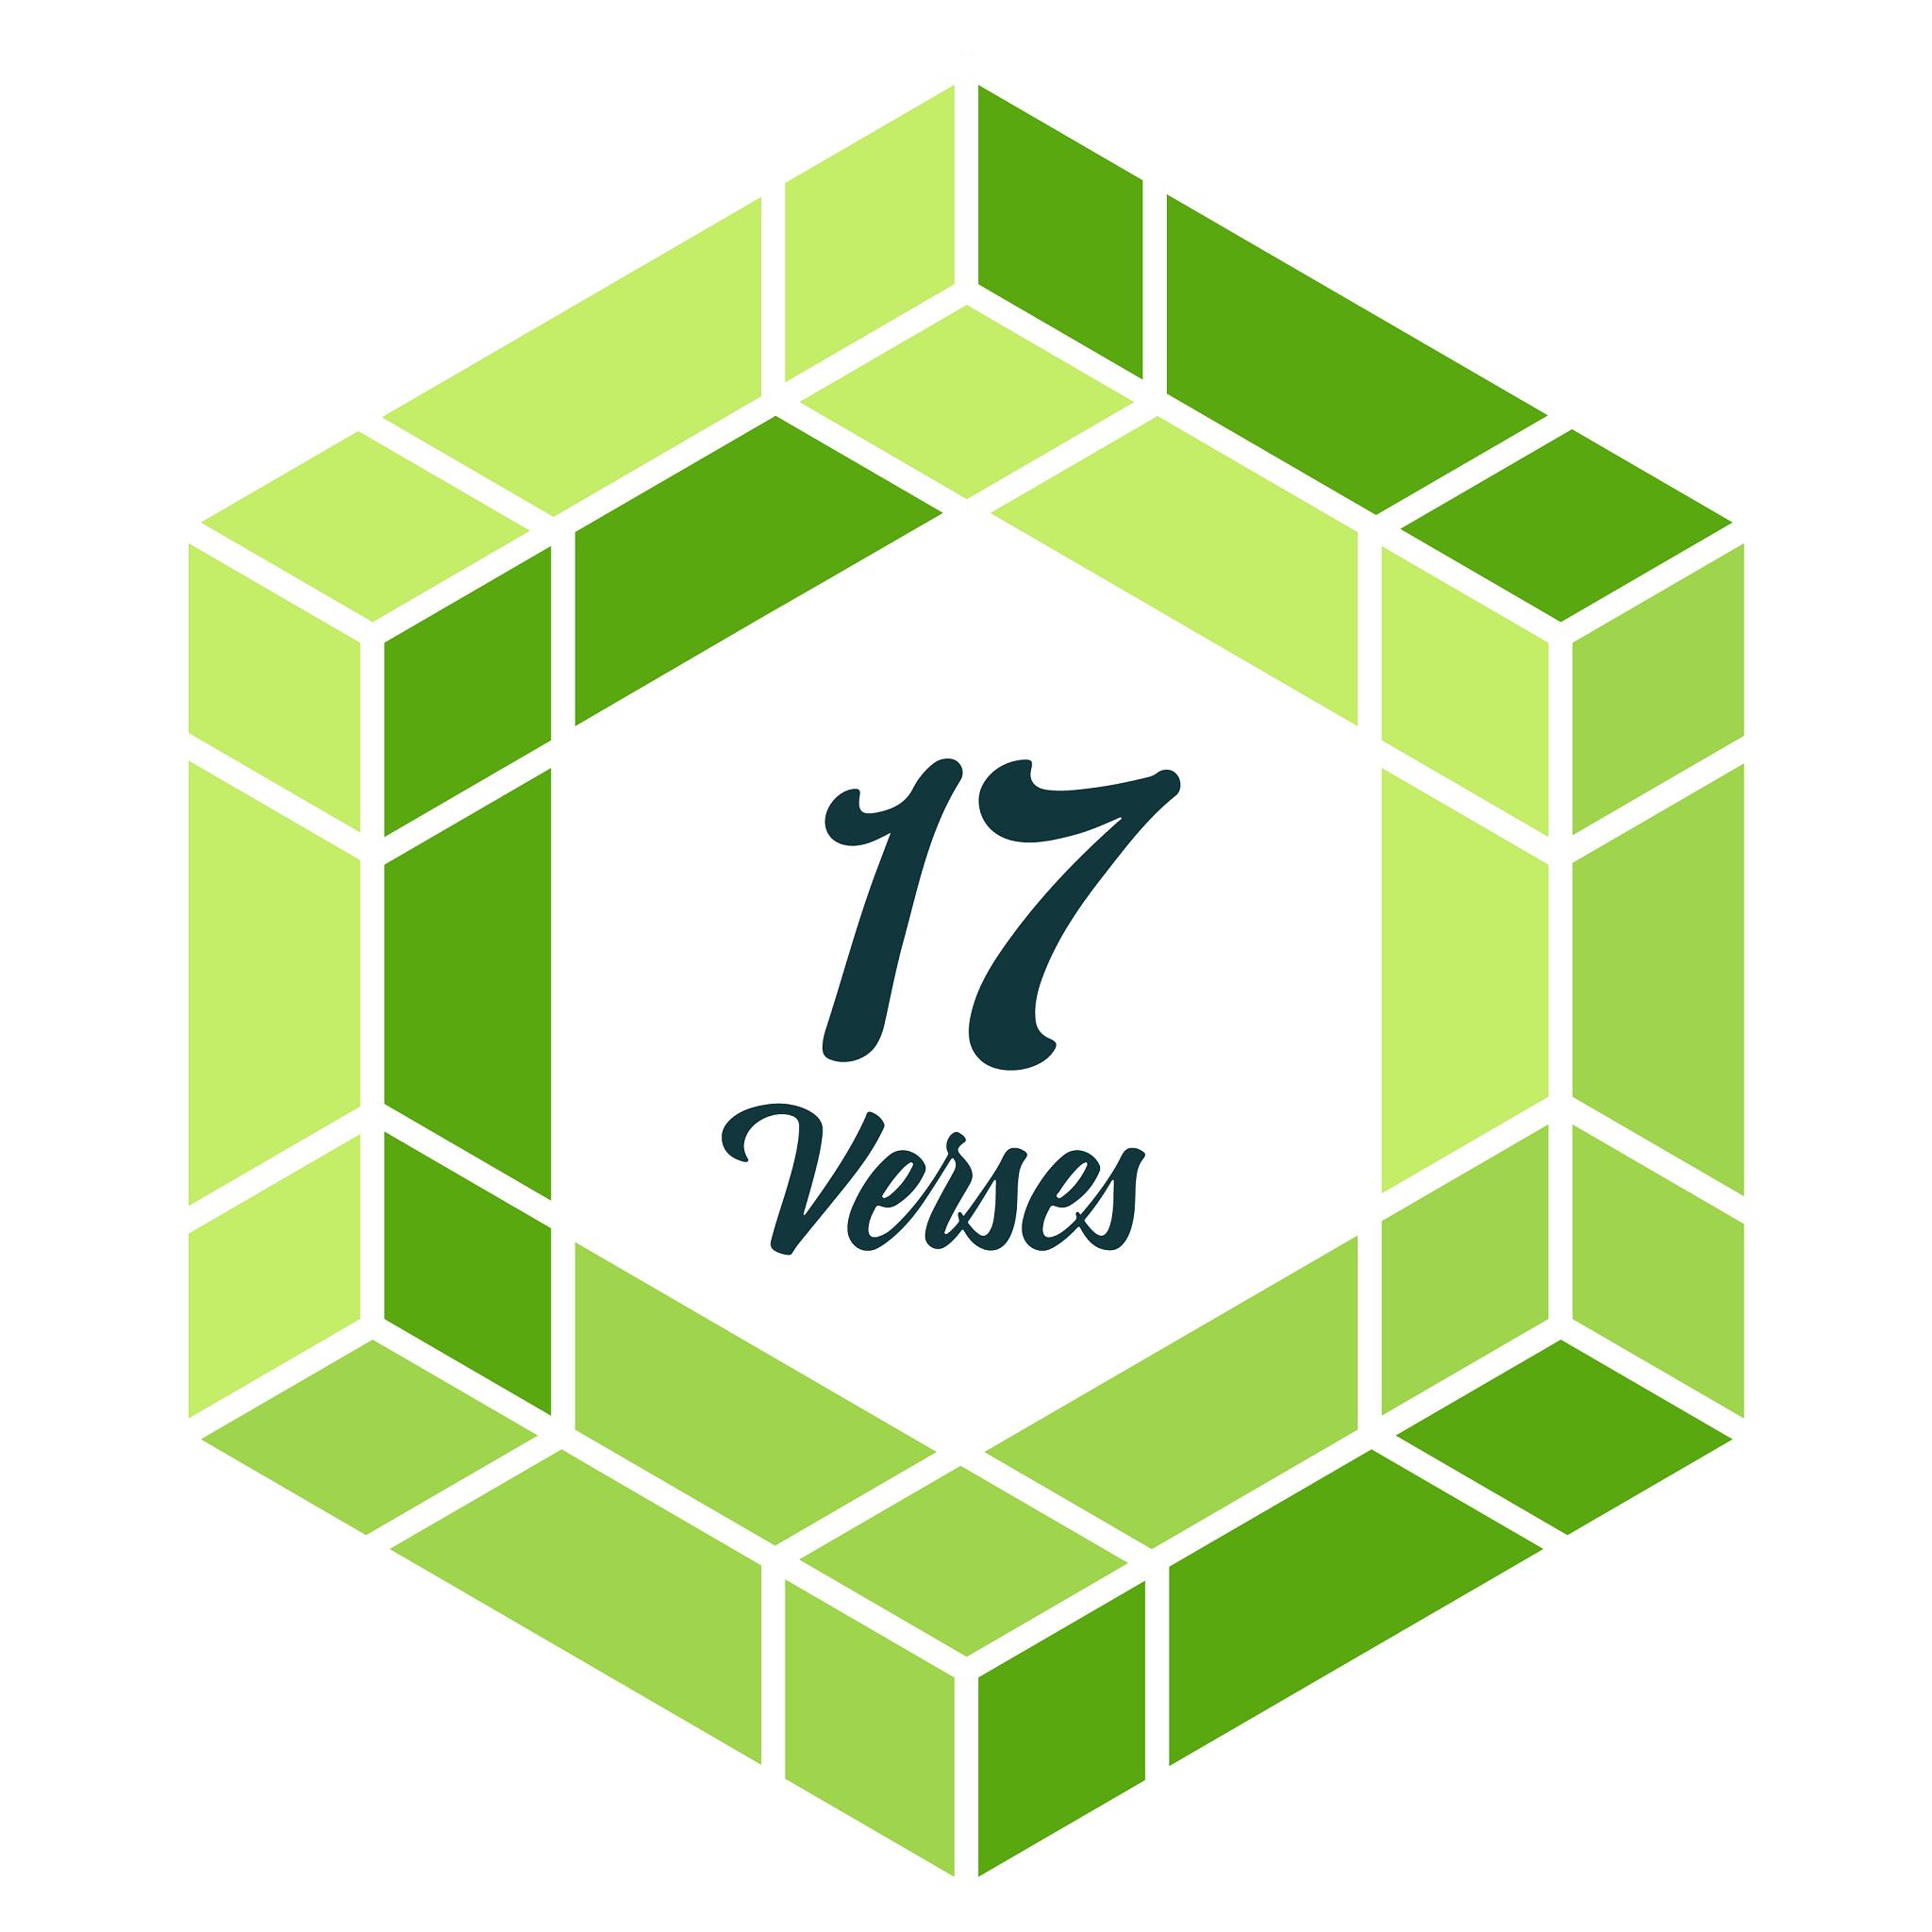 Year 2 - Surah 12 (Yüsuf), Verses 1-20